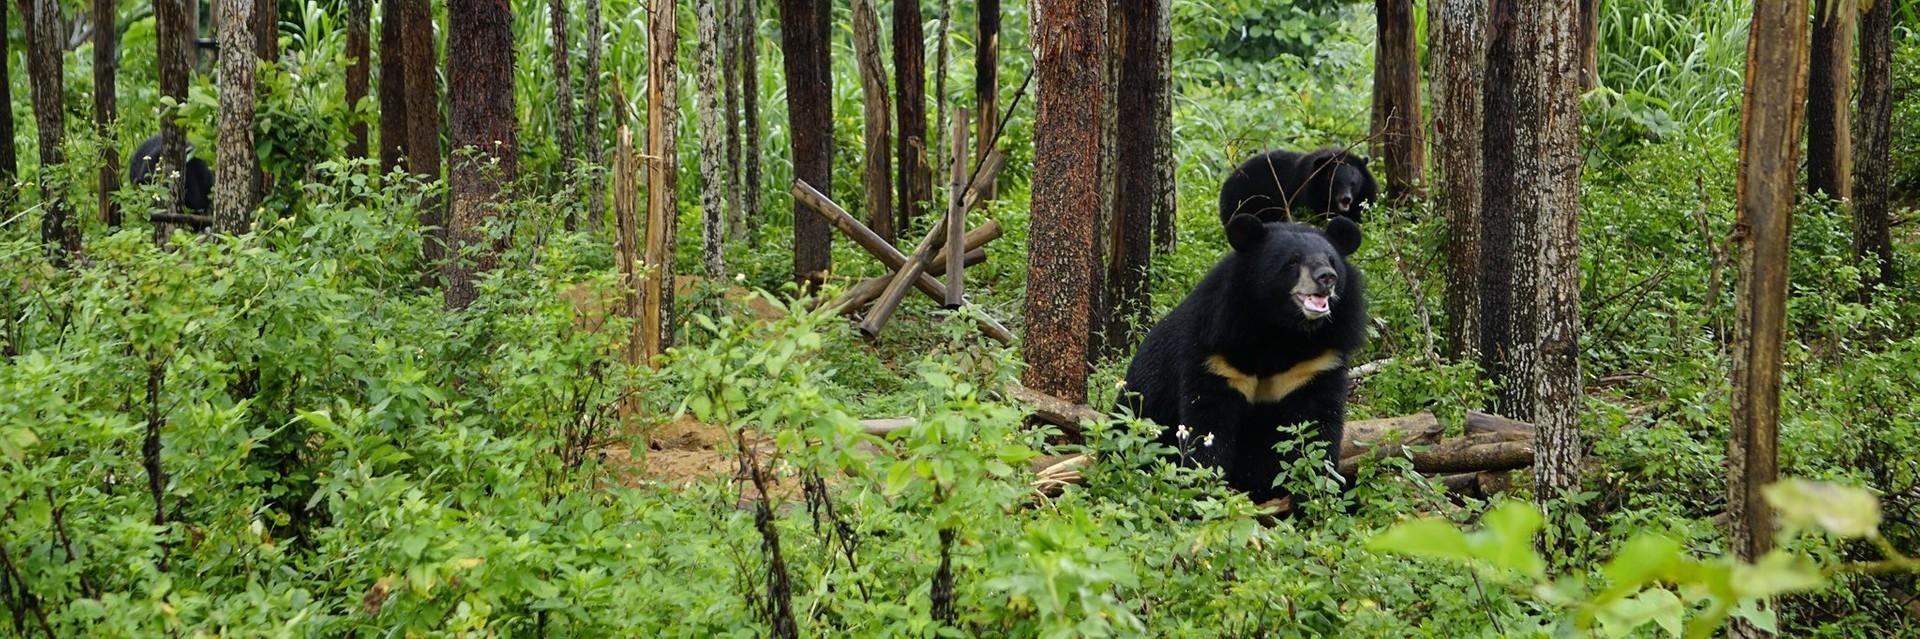 Asiatic black bear in the woods at Ninh Binh